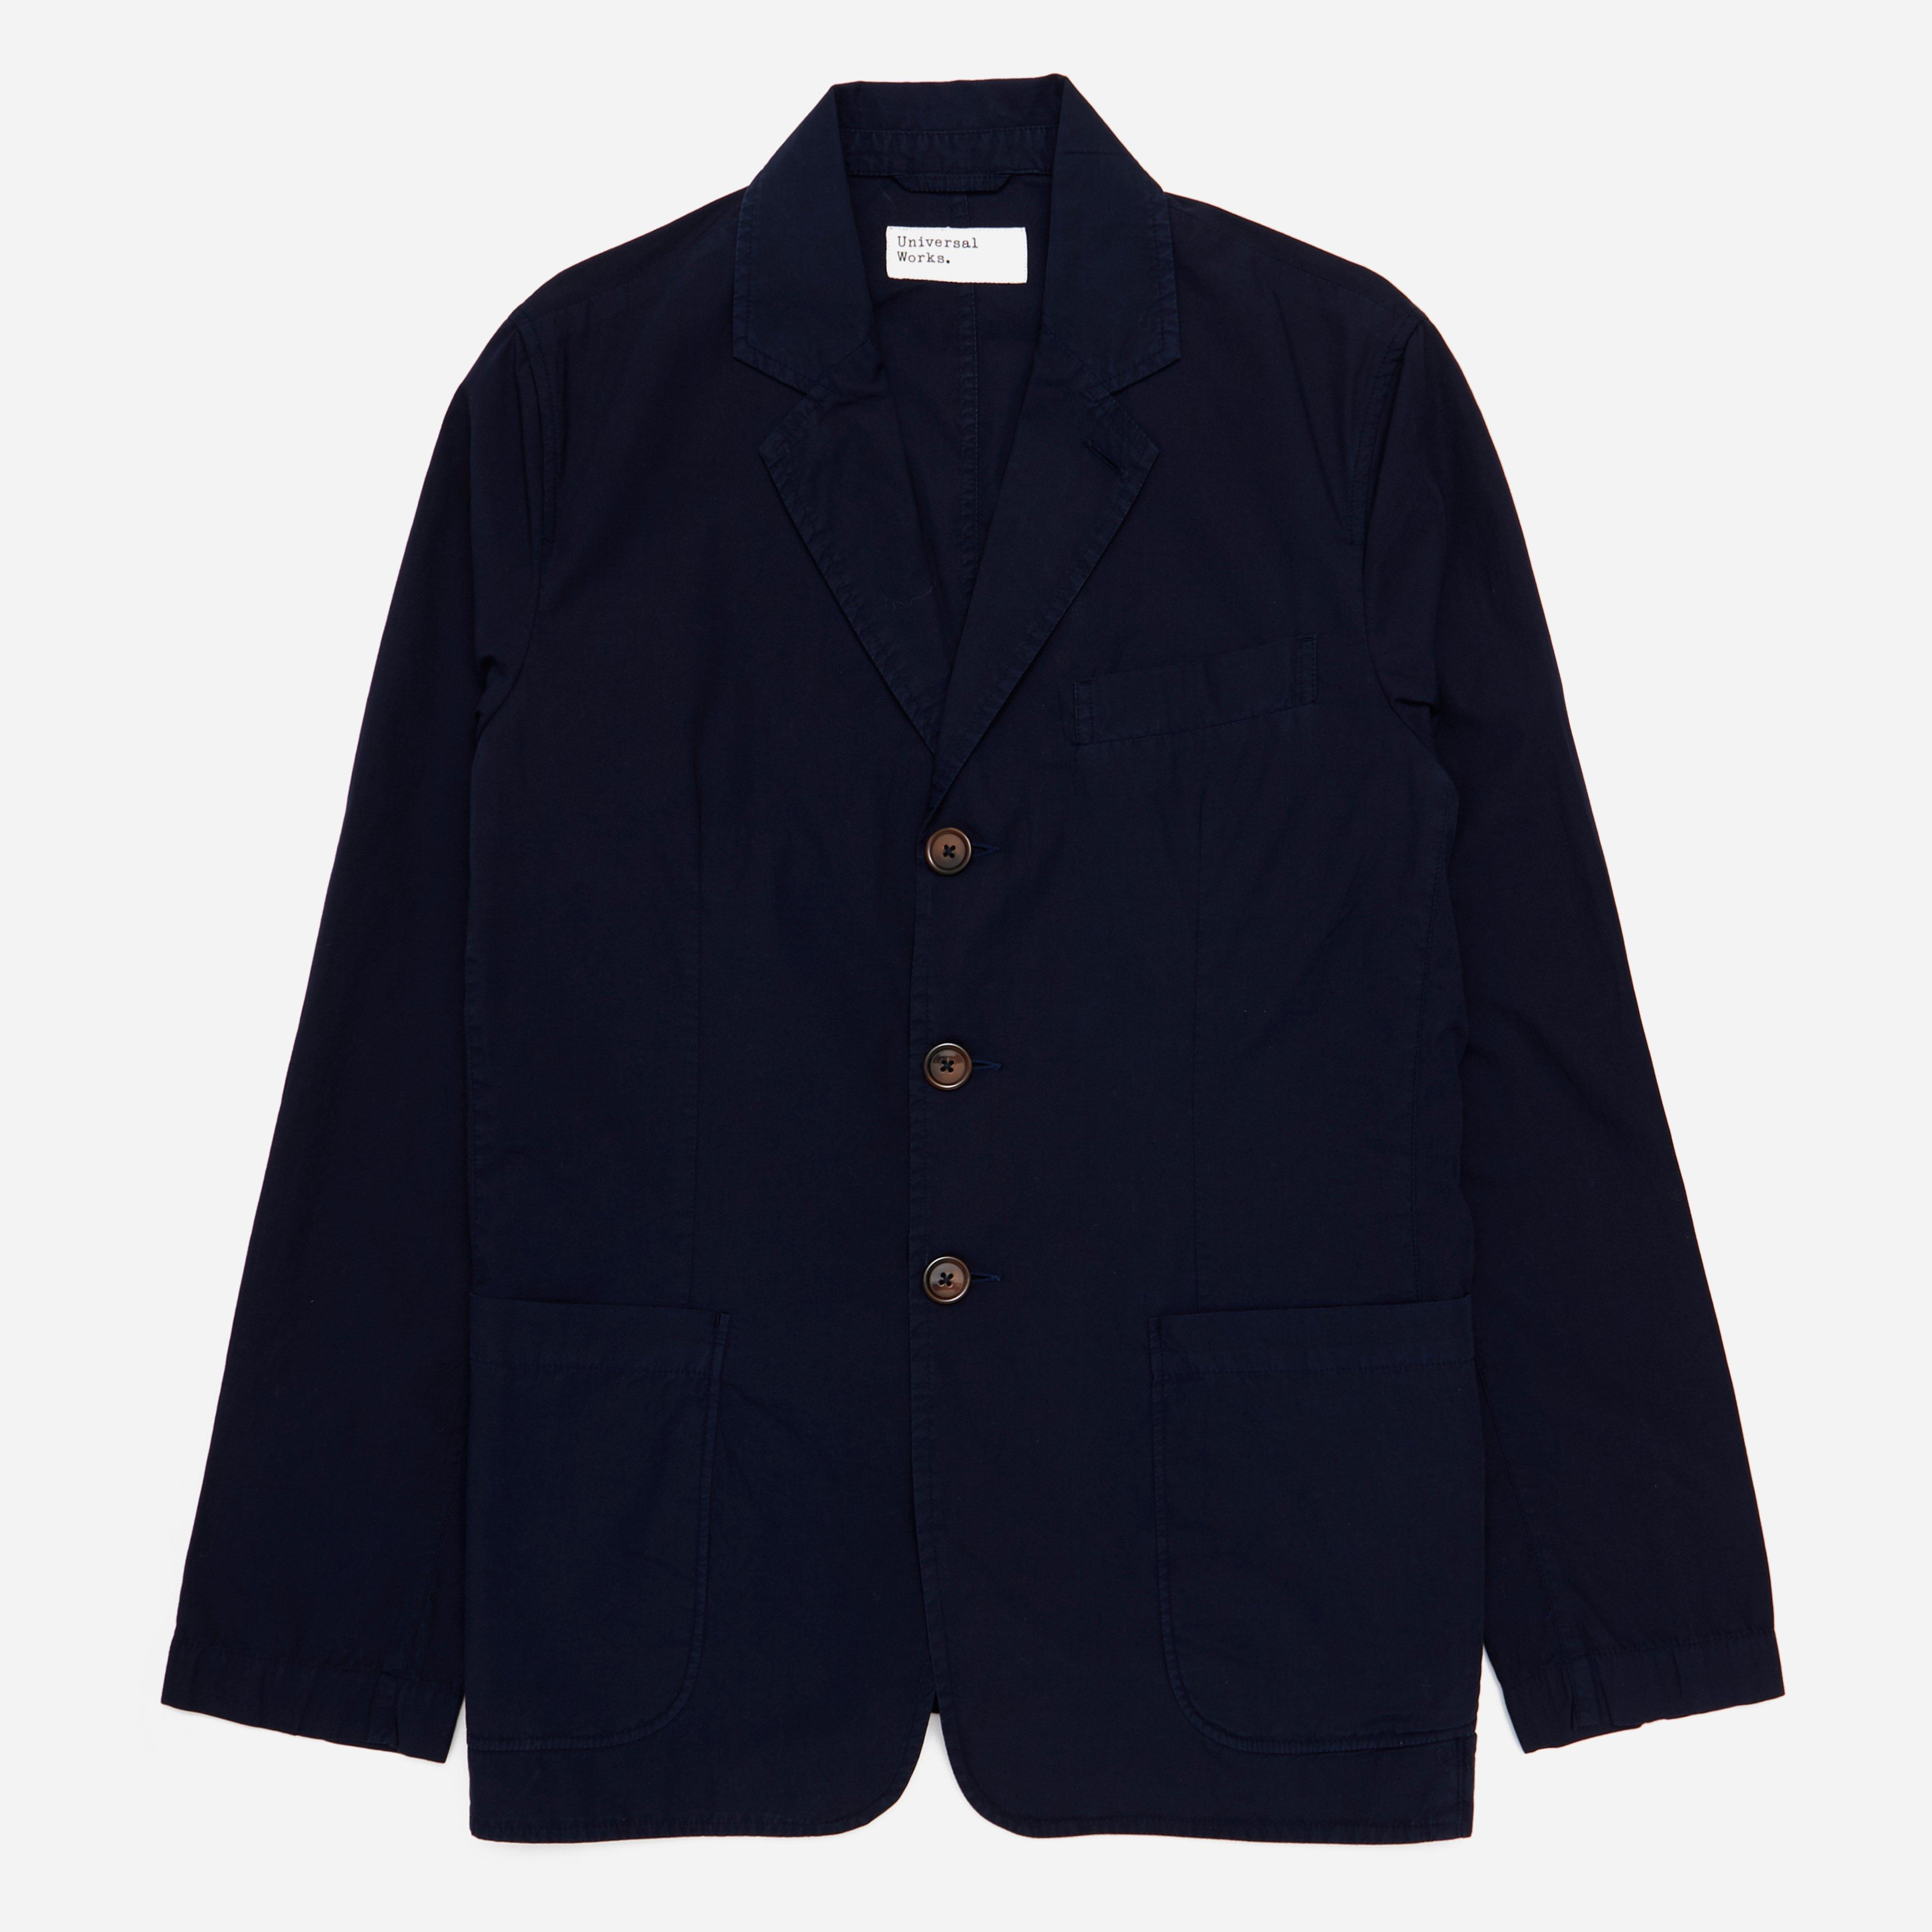 Universal Works London Jacket